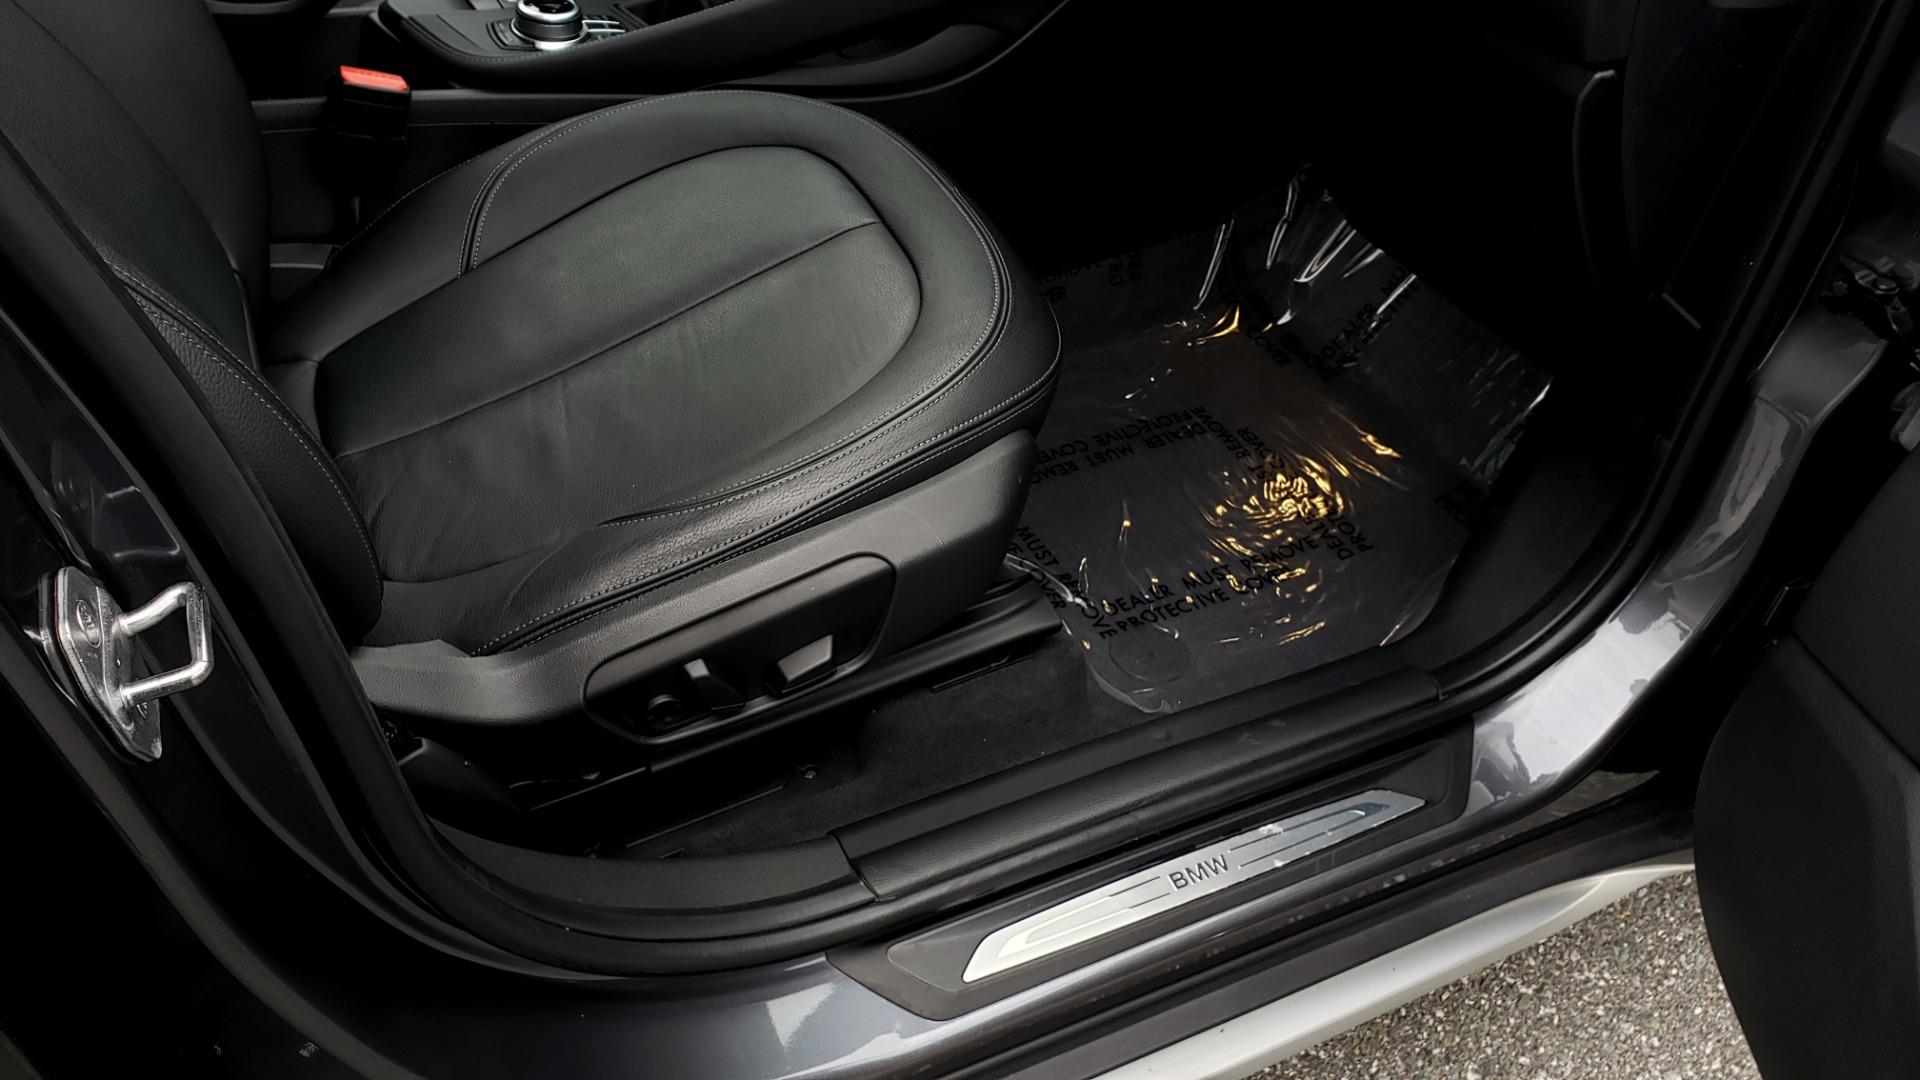 Used 2017 BMW X1 XDRIVE28I / PREM PKG / DRIVER ASST / NAV / CLD WTHR for sale Sold at Formula Imports in Charlotte NC 28227 68